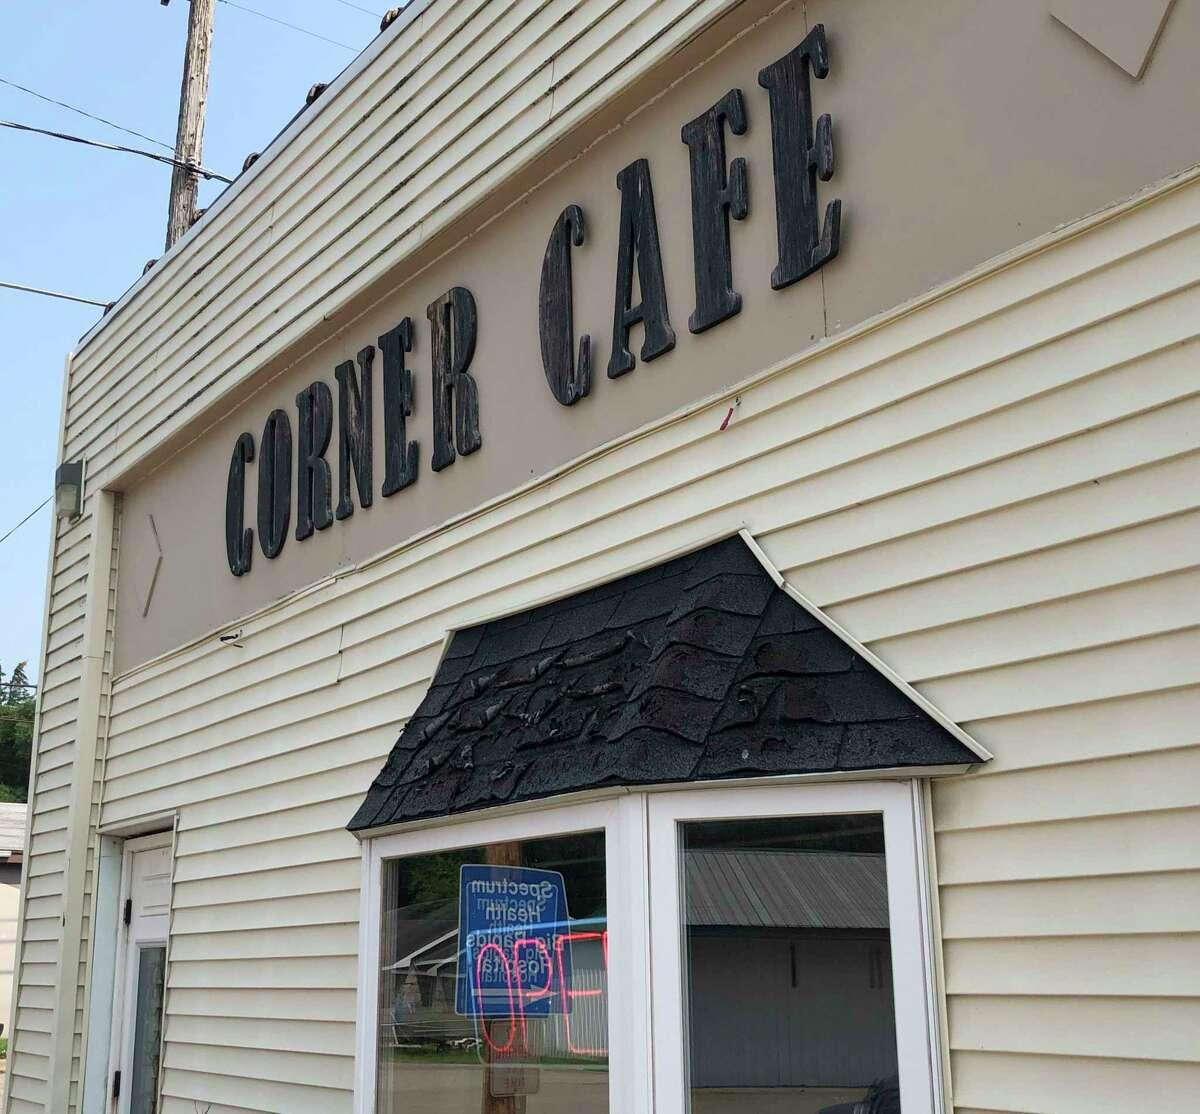 The Corner Cafe, in Stanwood, is a welcoming littlehidden gem in Mecosta County's own backyard.(Pioneer photo/Joe Judd)